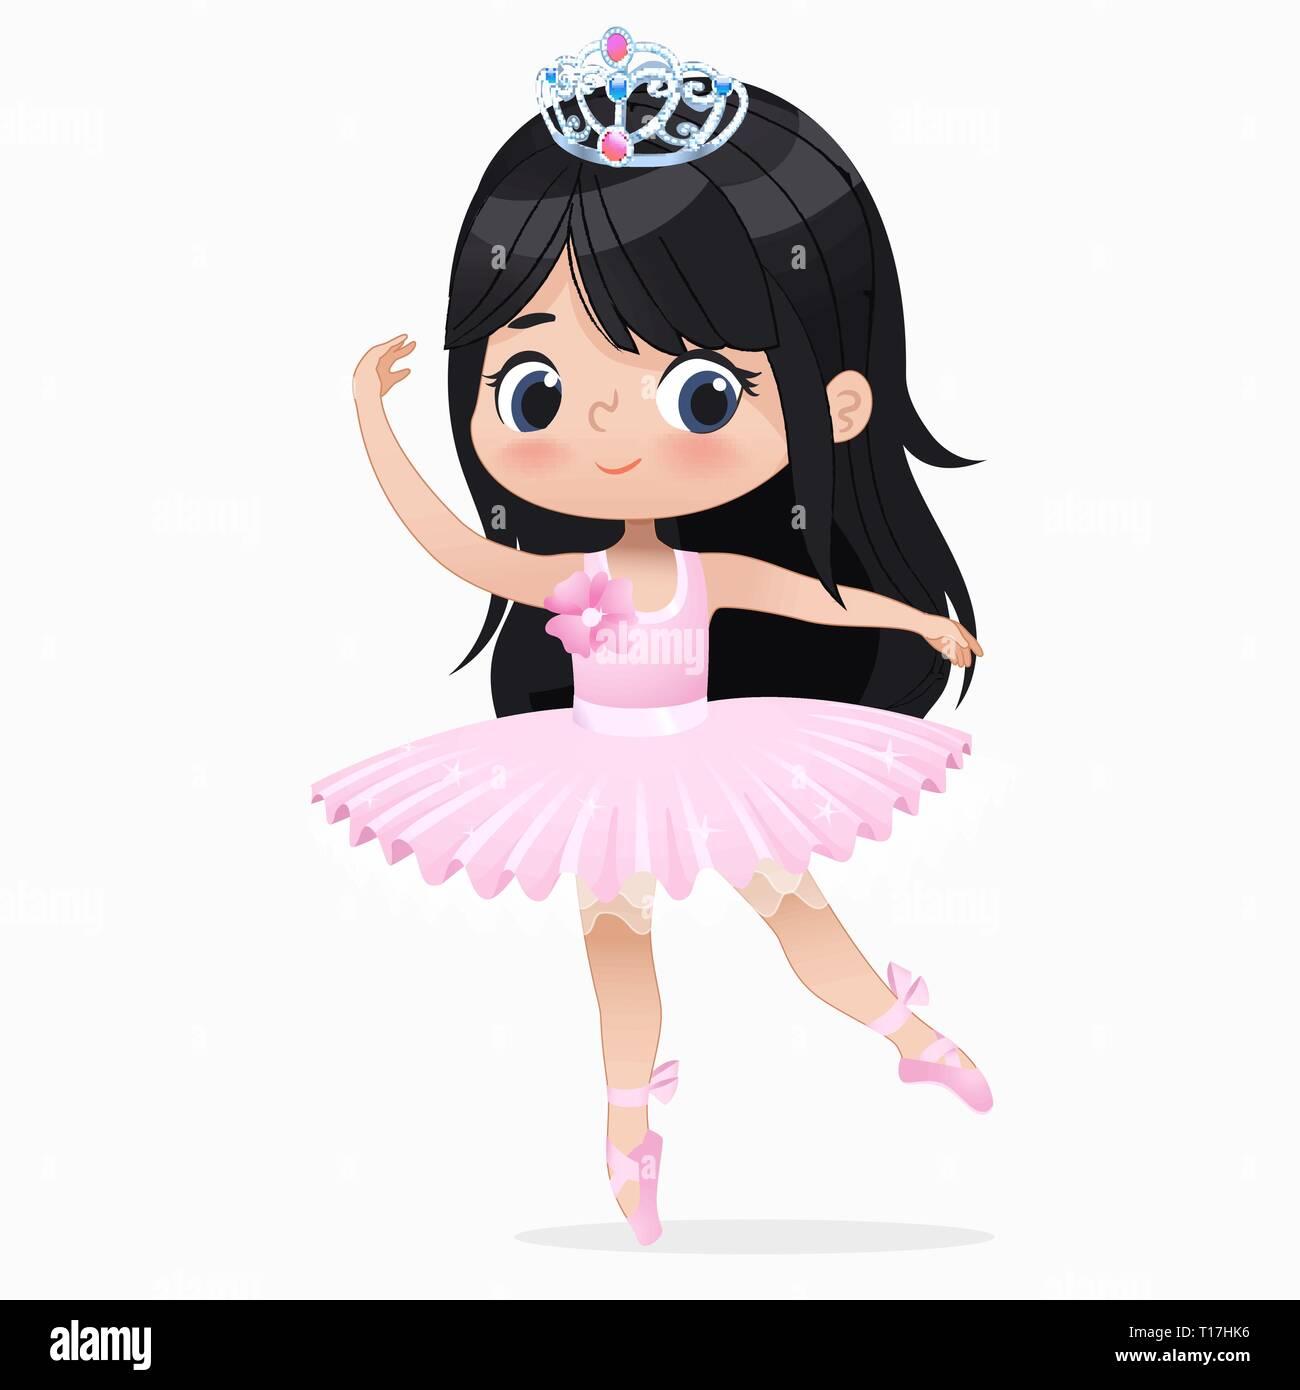 Cute Petite Fille Brune Ballerine Dance Isolés Caucasian